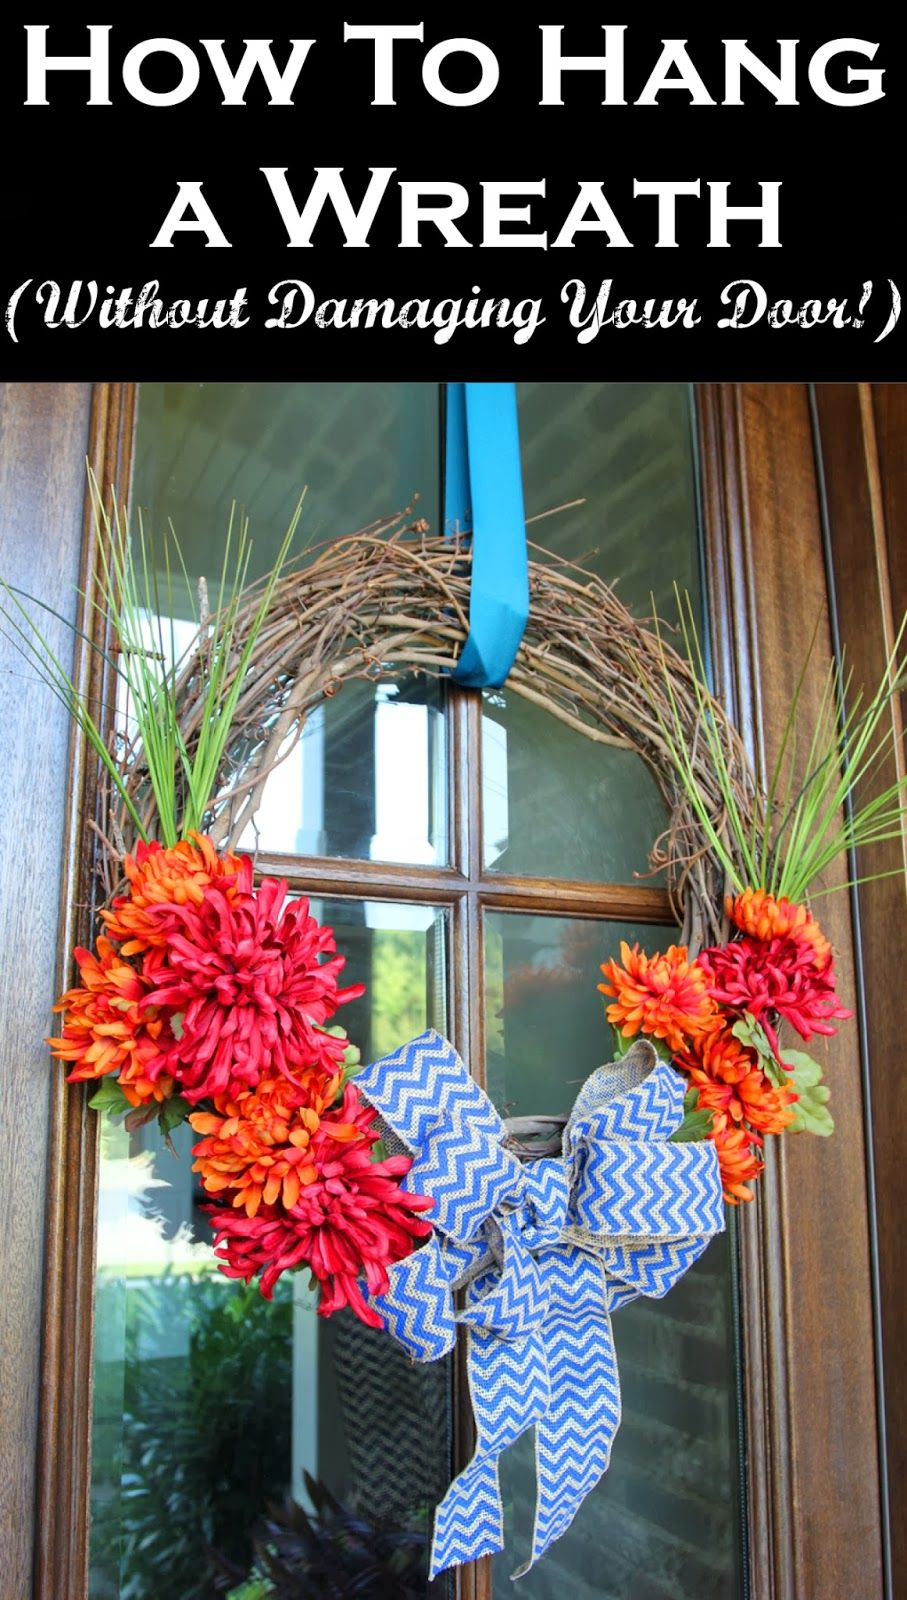 How to Hang a Wreath on a Storm Door